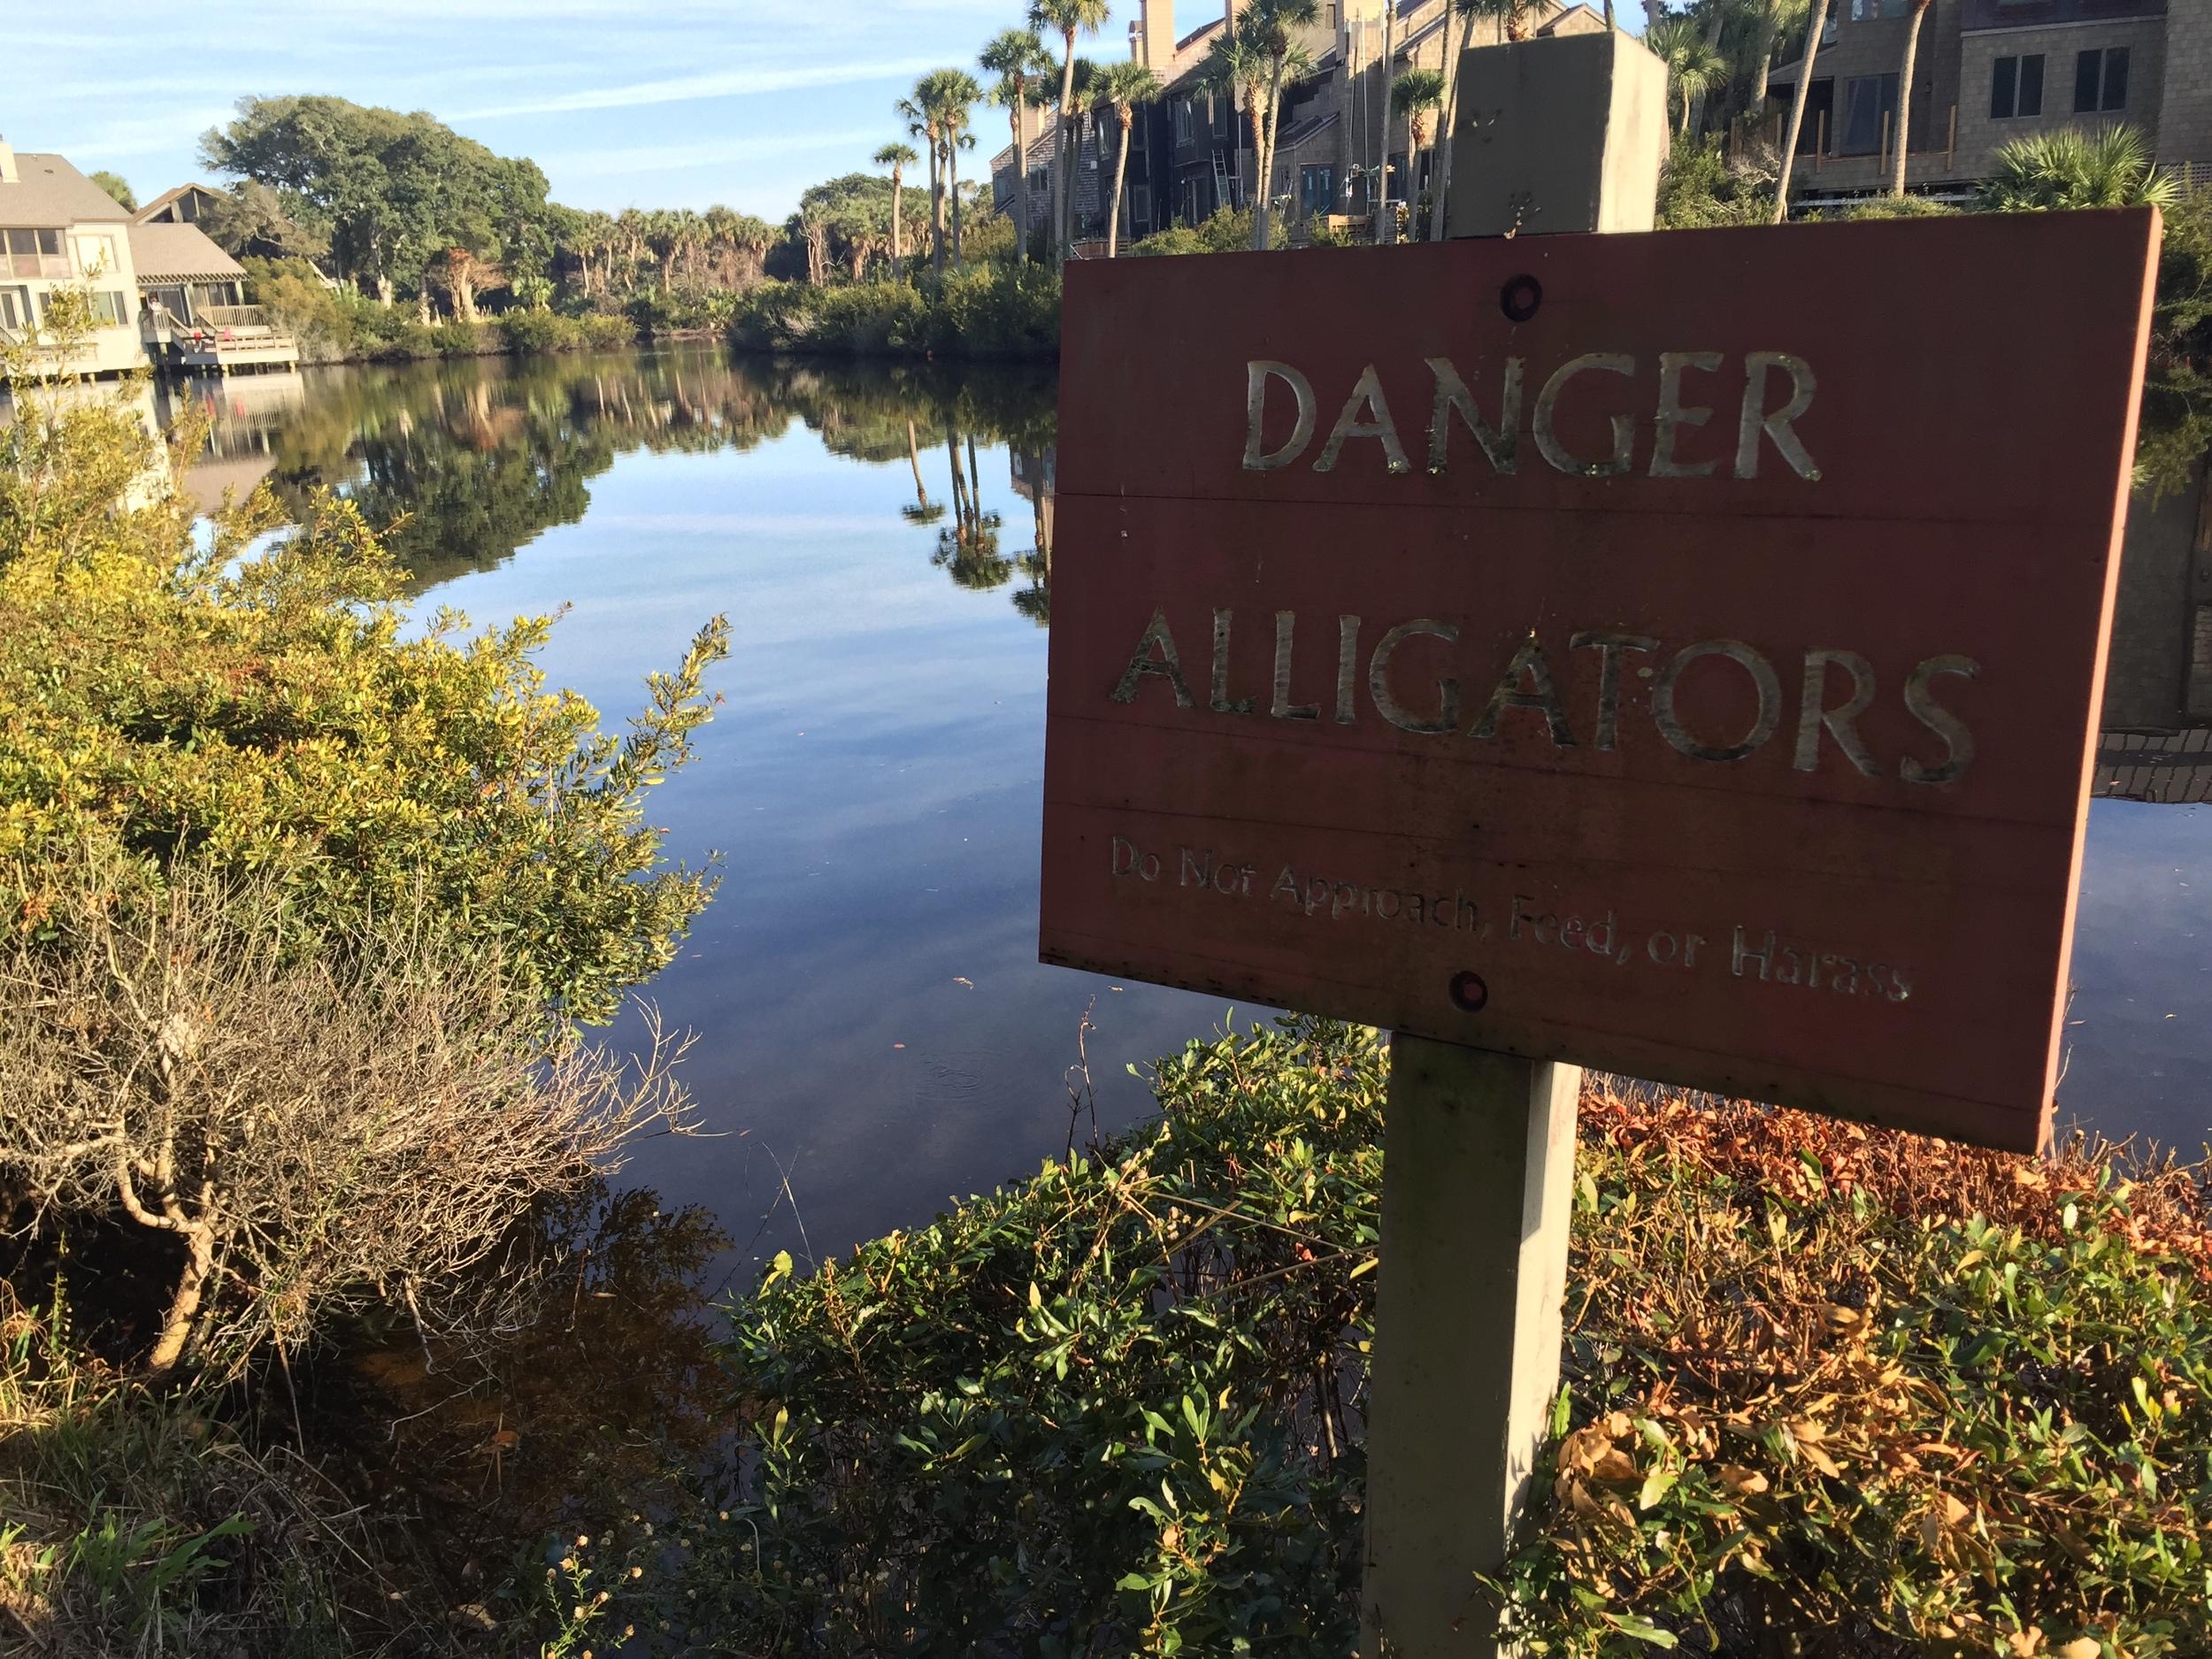 Don't harass the alligators... check.